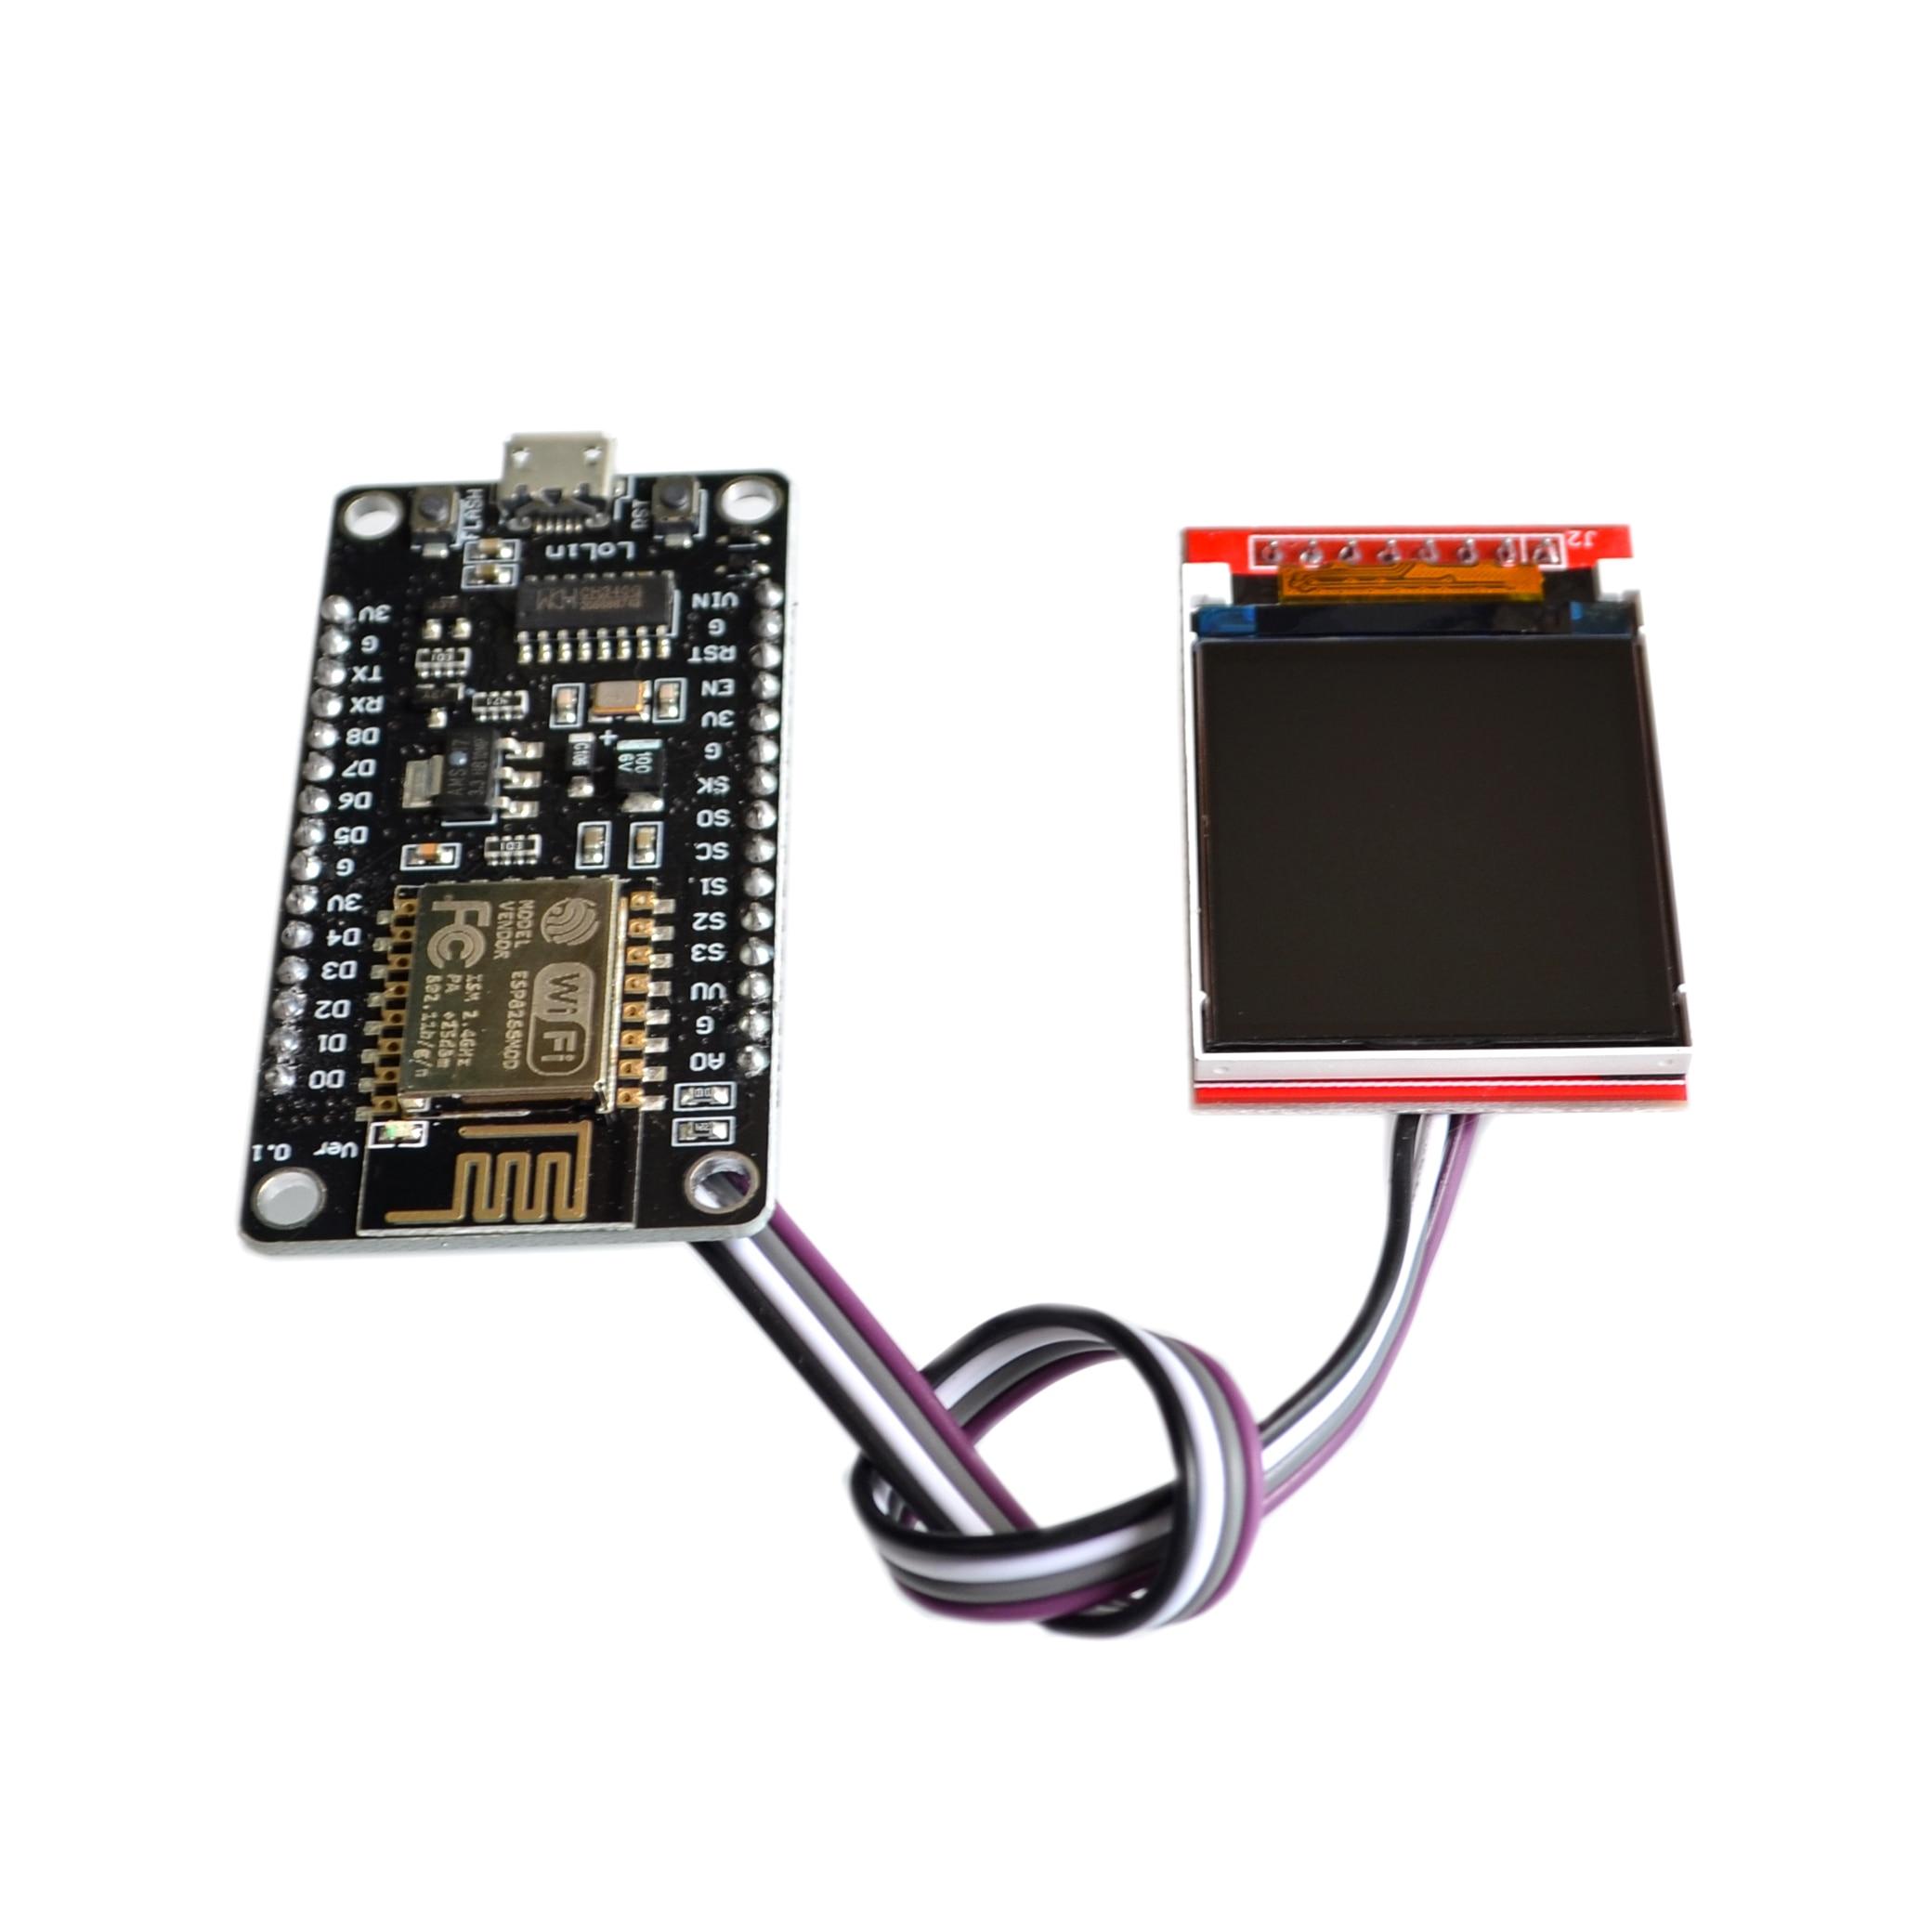 ESP8266 Development Kit with Display Screen TFT Show Image or Word by Nodemcu Board DIY Kit CH340 NodeMcu V3 Lua WIFI